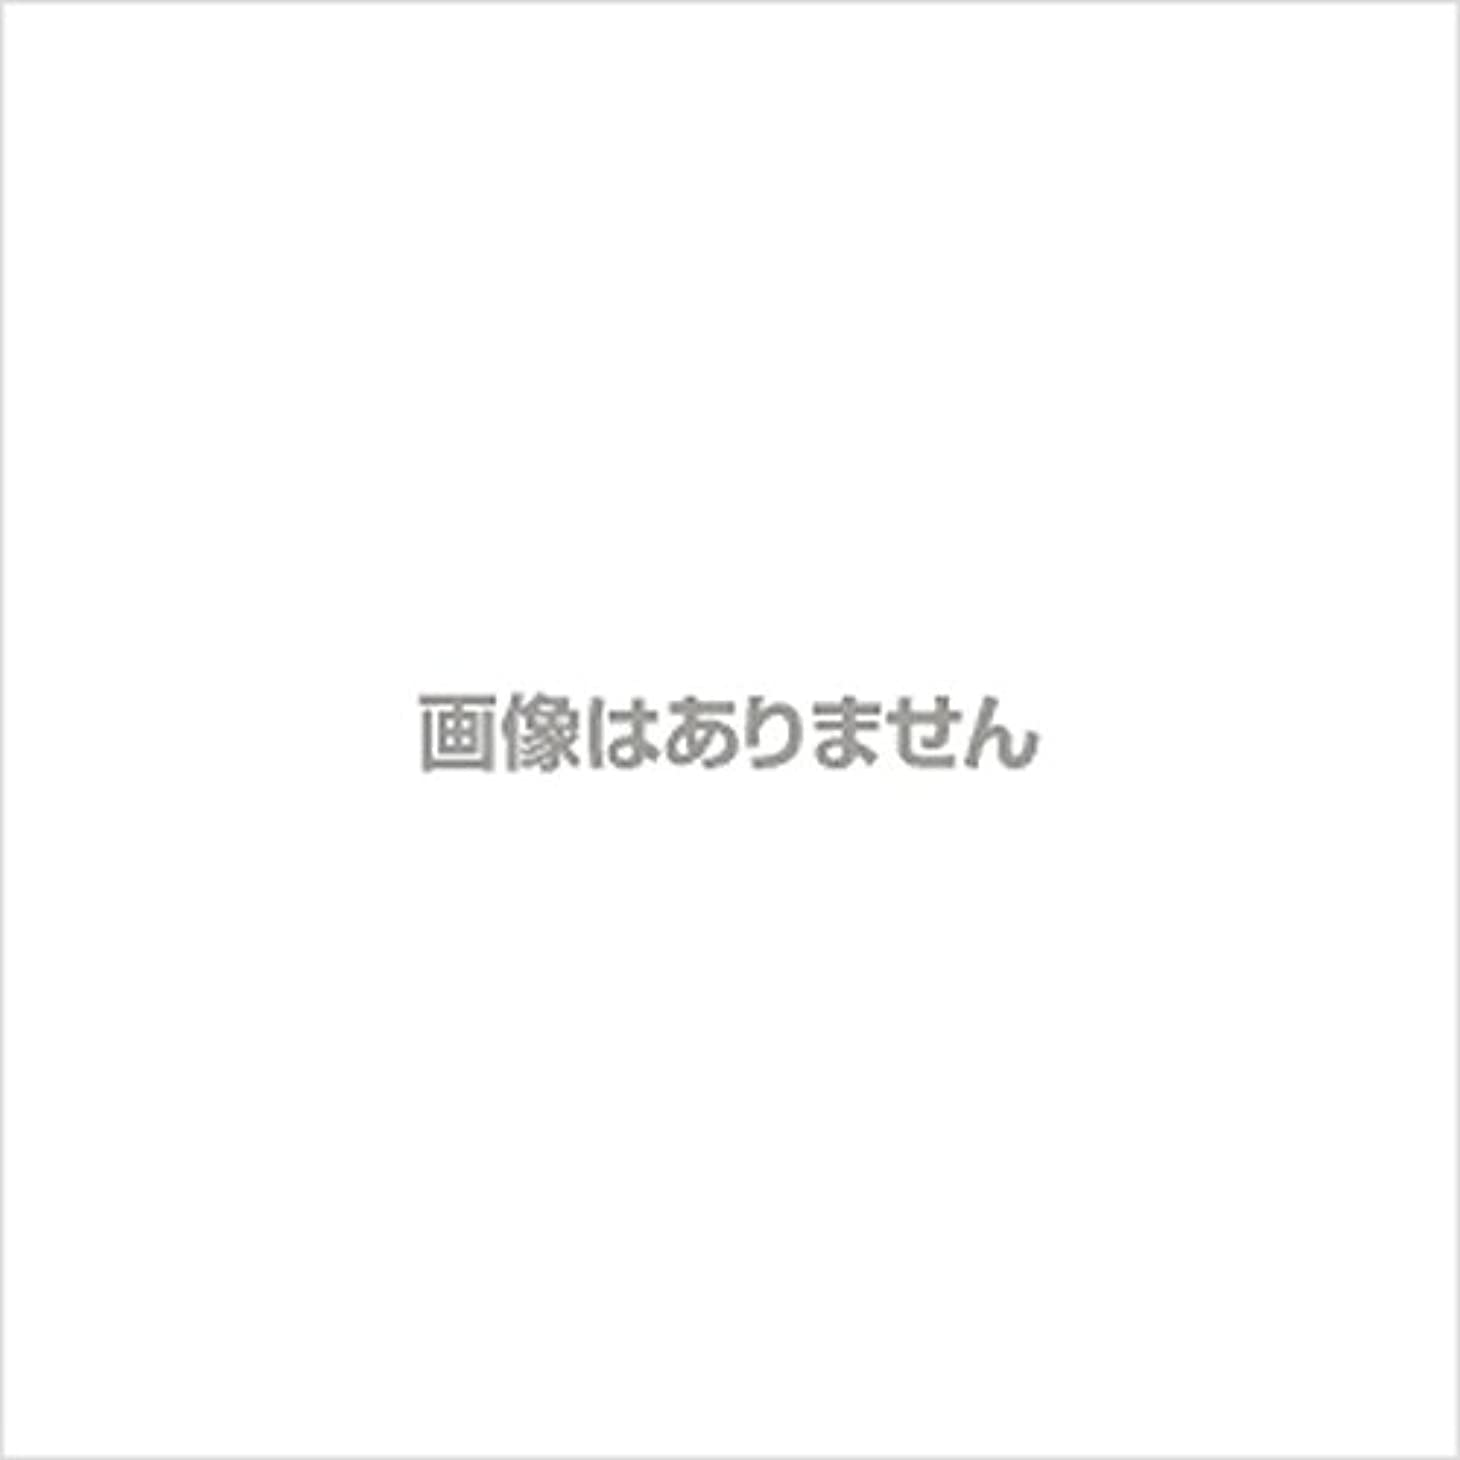 白十字 FC ポリ手袋 6枚入